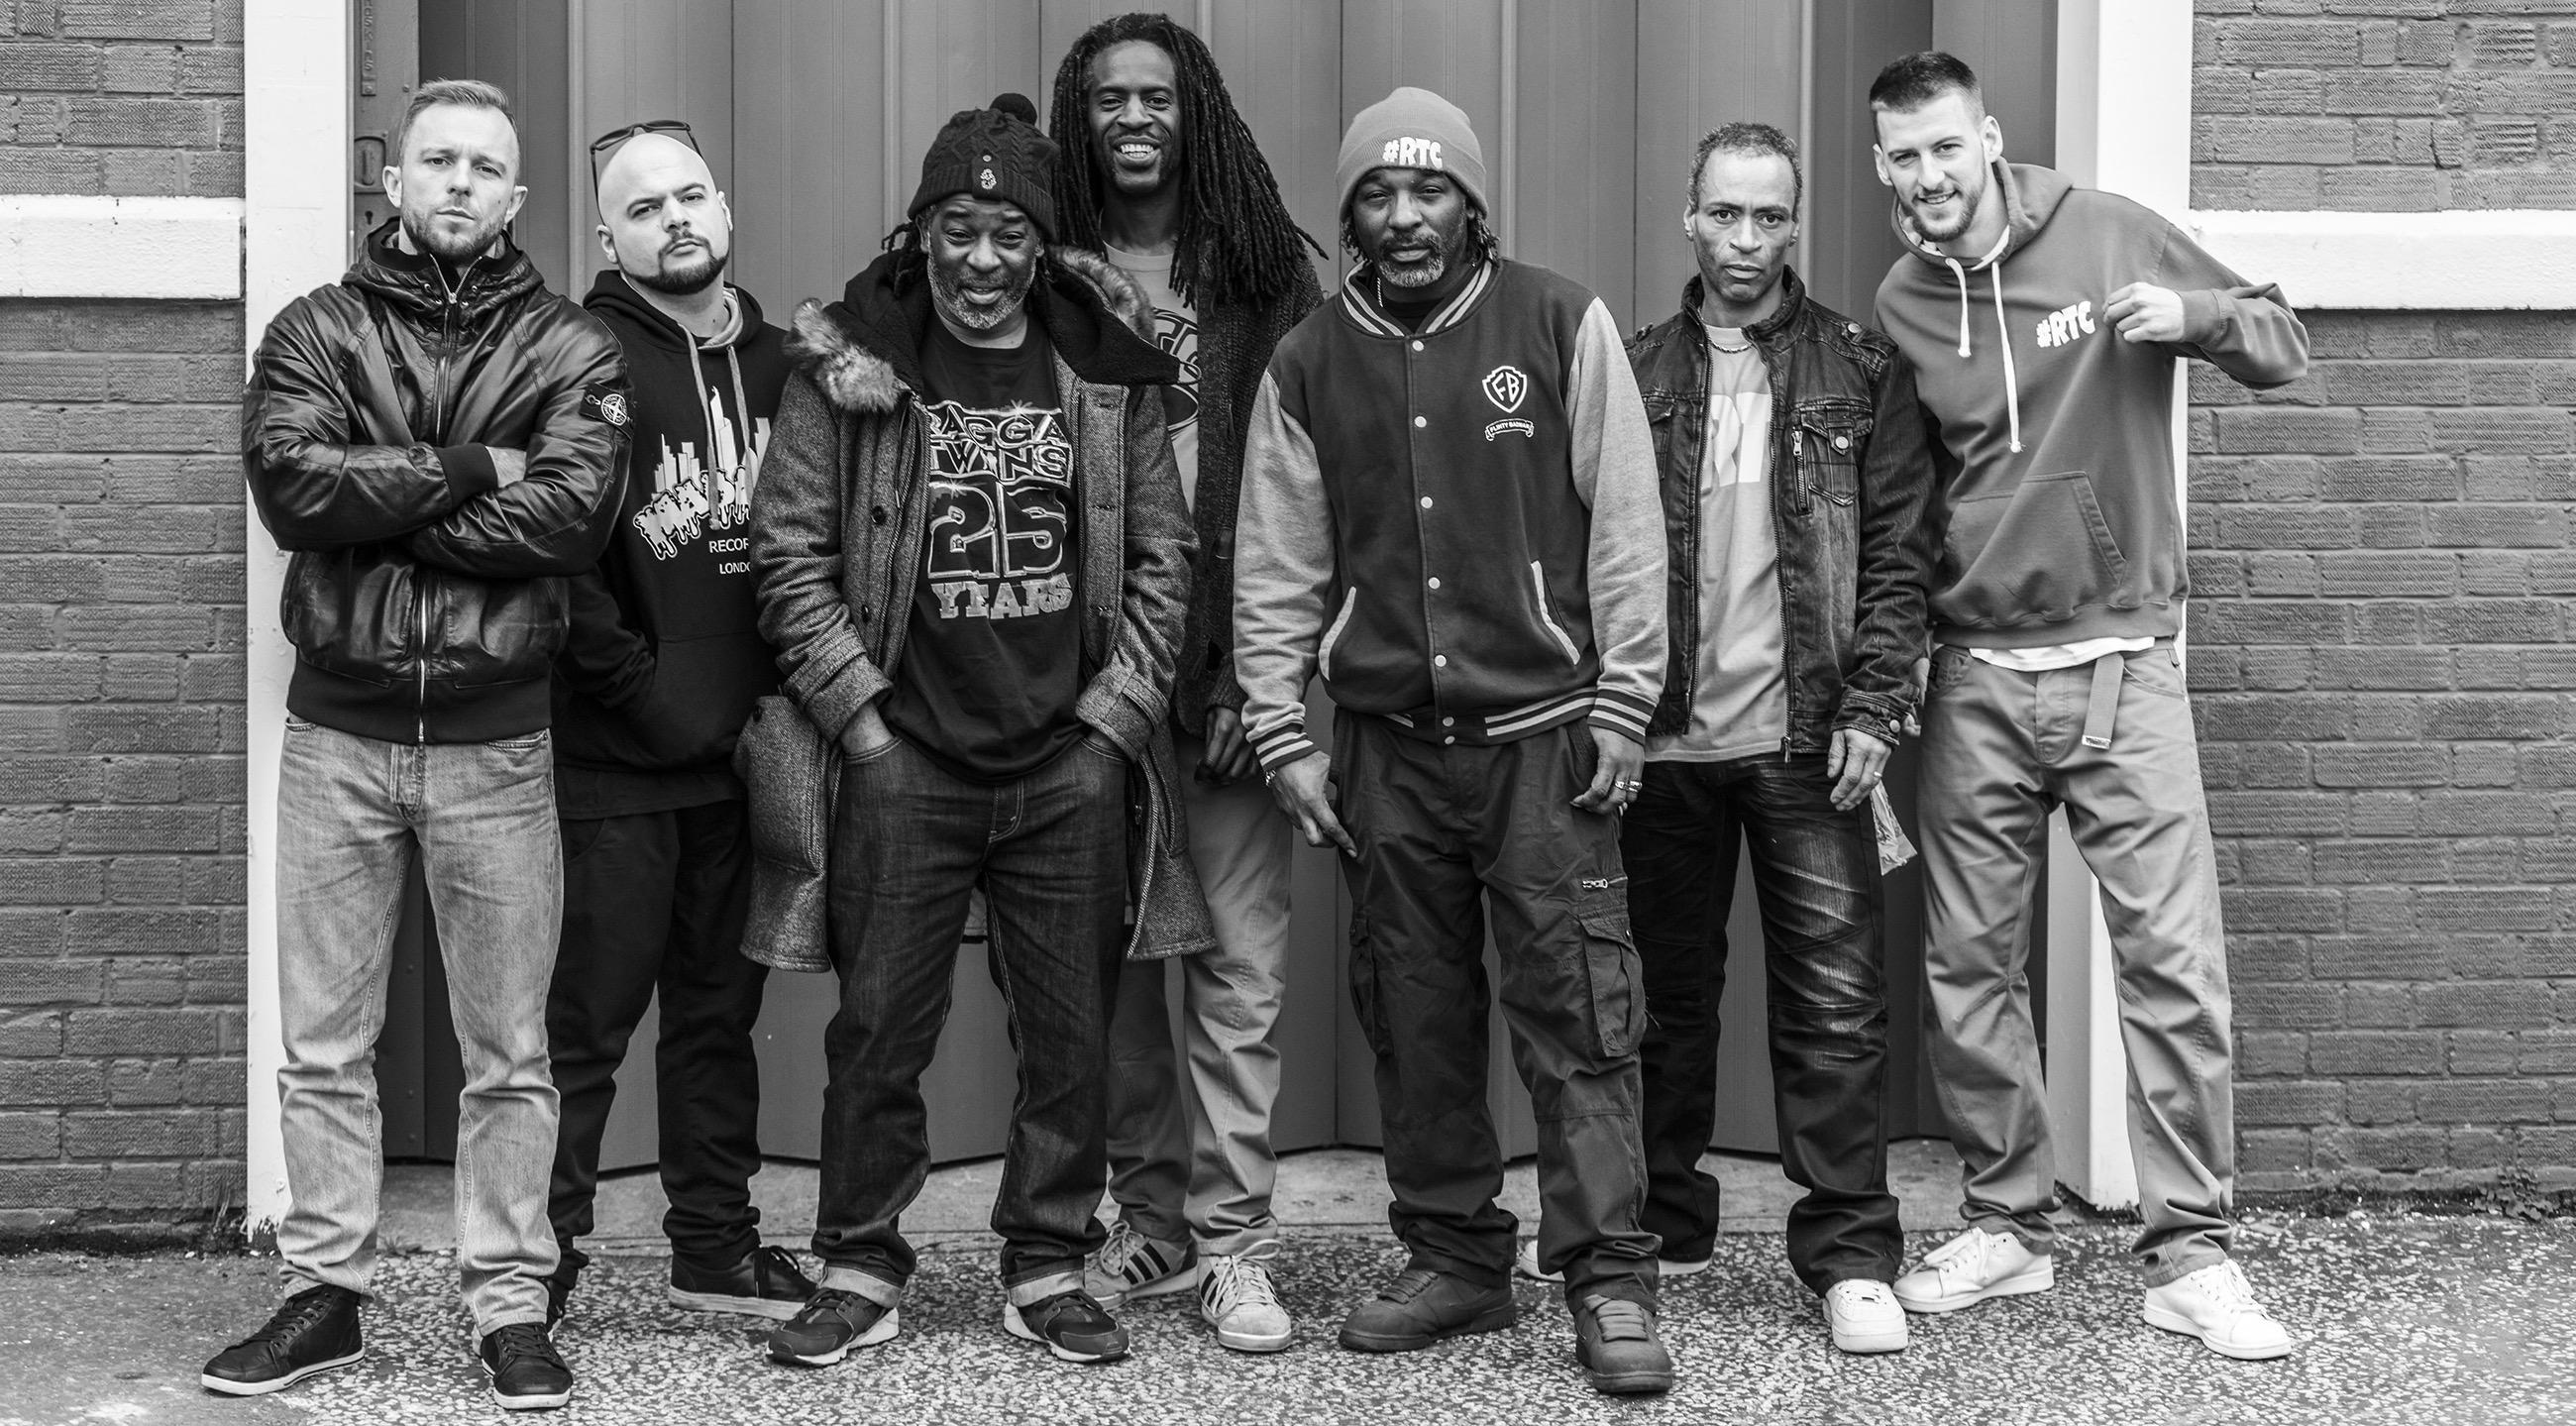 Ragga Twins Crew PyroRadio, PyroRadio.com, Flinty Badman, Deman Rockers, MC Co-Gee, Pedro Slimer, dj Danny Shutdown, DJ BLAZE-MOORE, Mtek1lla